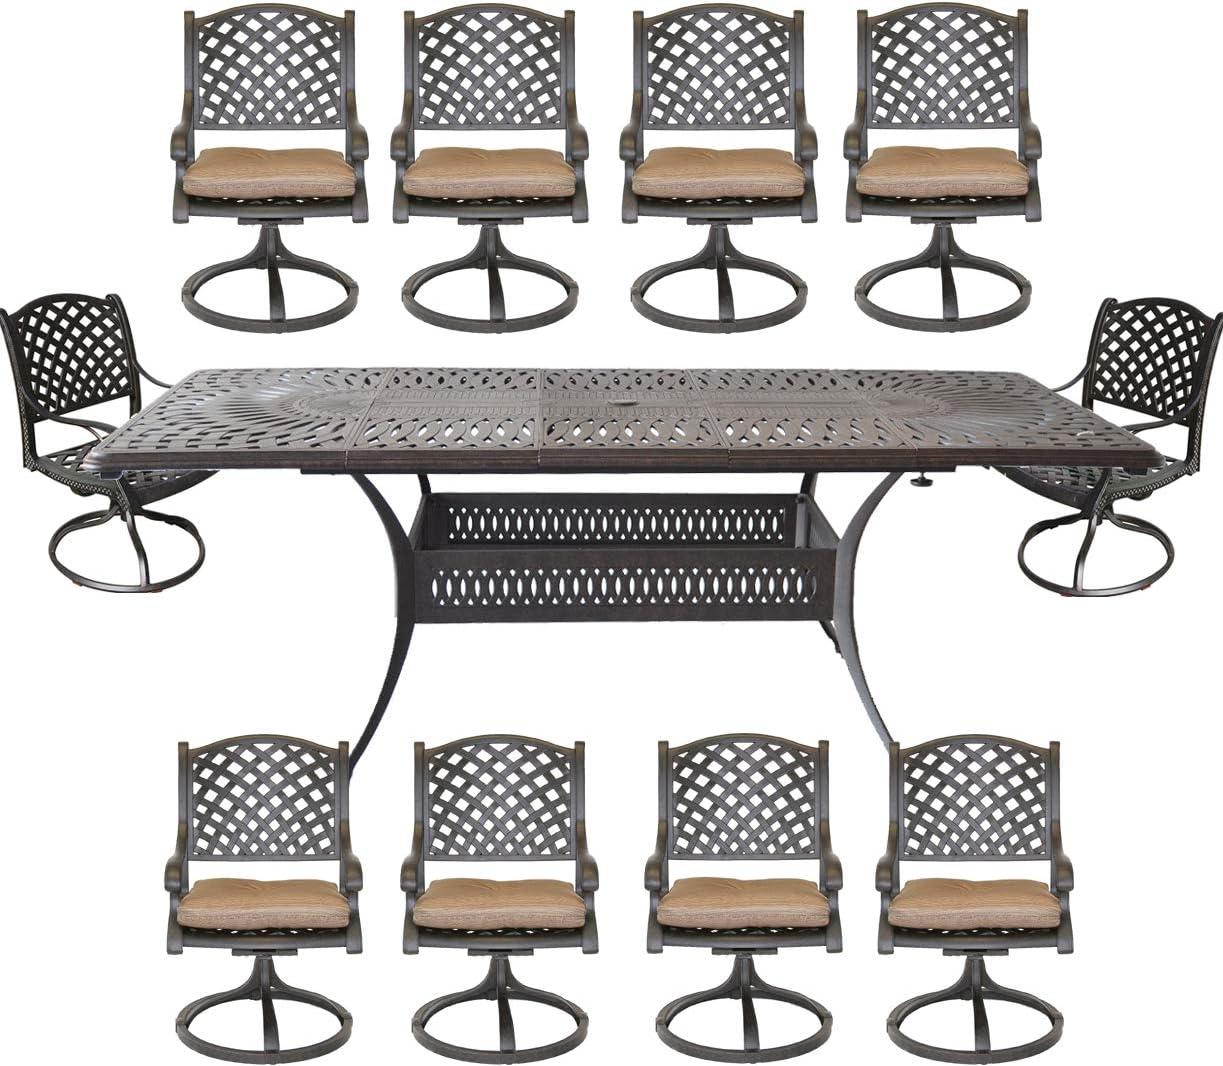 Amazon Com 11 Piece Outdoor Dining Set Extendable Table Seats 10 With Umbrella Hole Swivel Rocker Patio Chairs Cast Aluminum Furniture Garden Outdoor